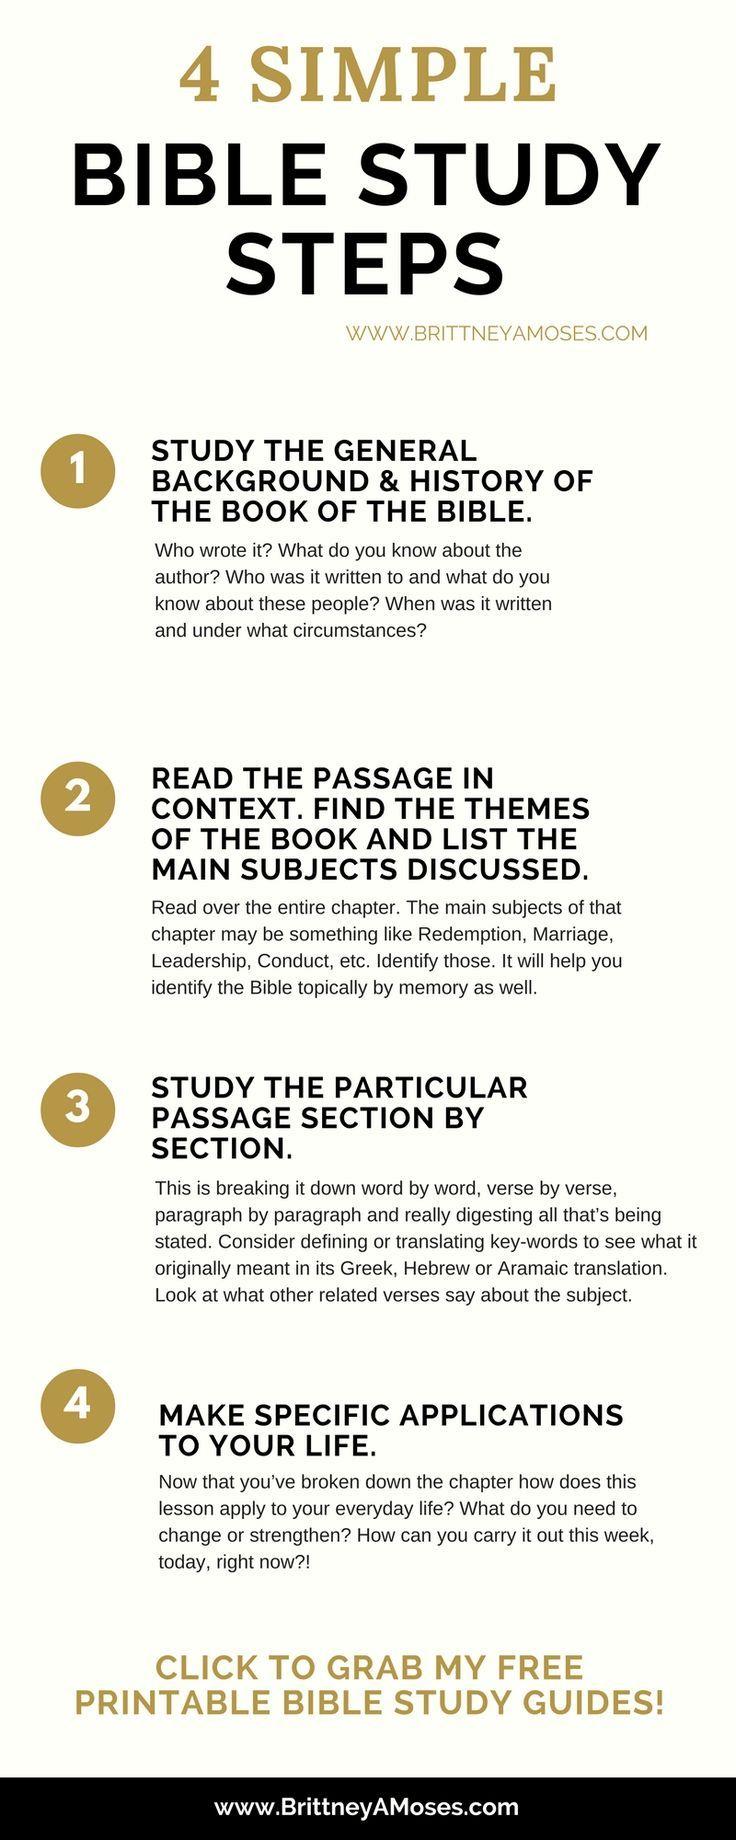 4 Simple Bible Study Steps   God's Word   Pinterest   Bible, Bible - Free Printable Bible Study Guides